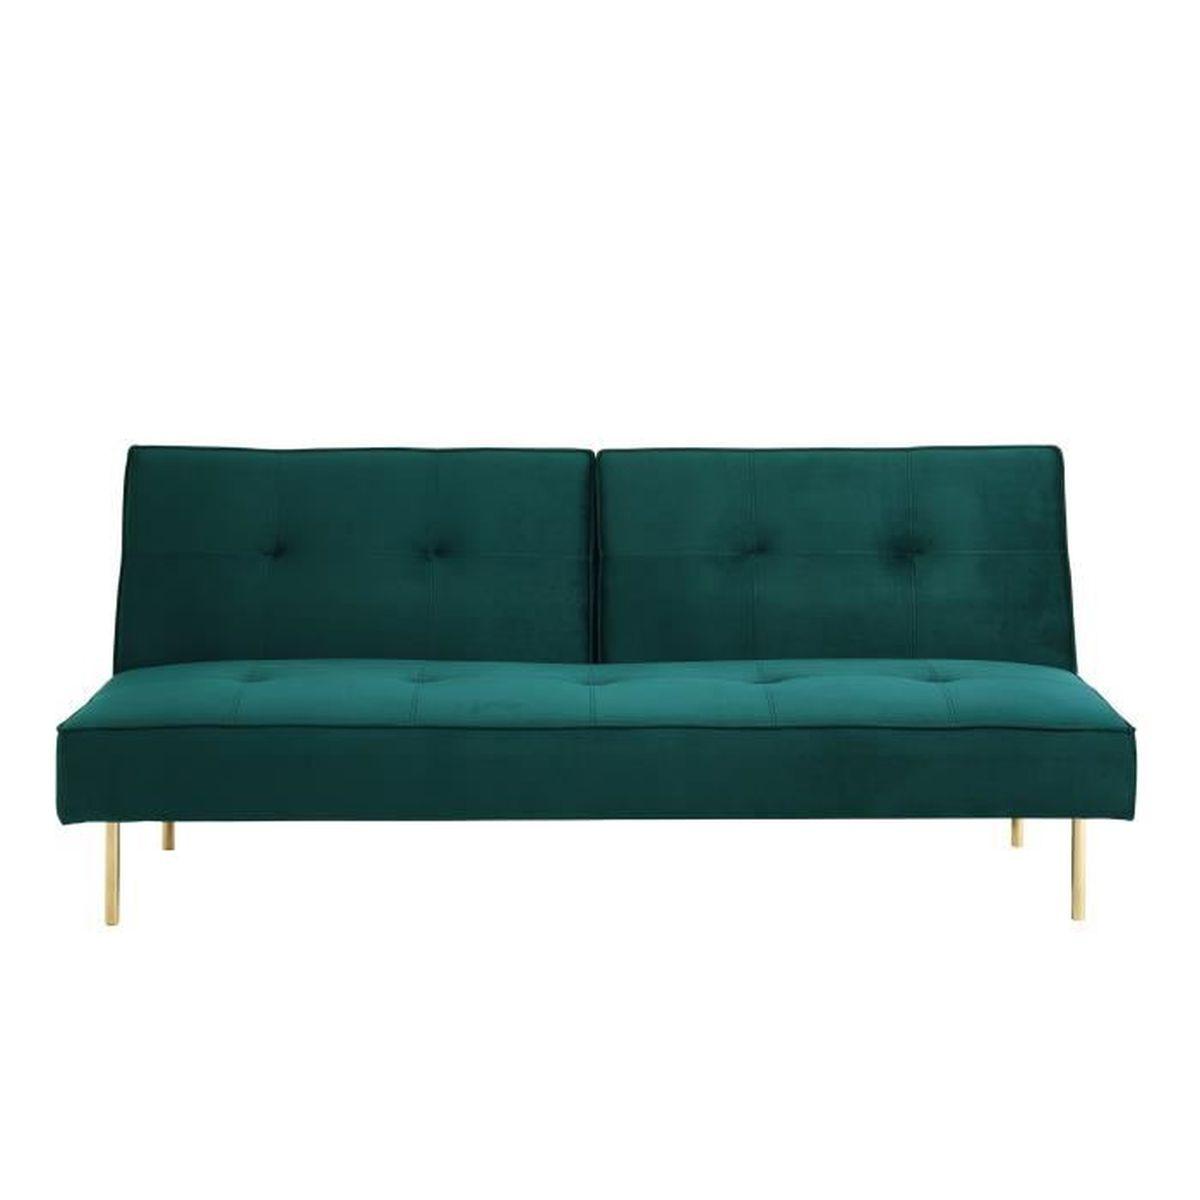 clic clac achat vente clic clac pas cher cdiscount. Black Bedroom Furniture Sets. Home Design Ideas